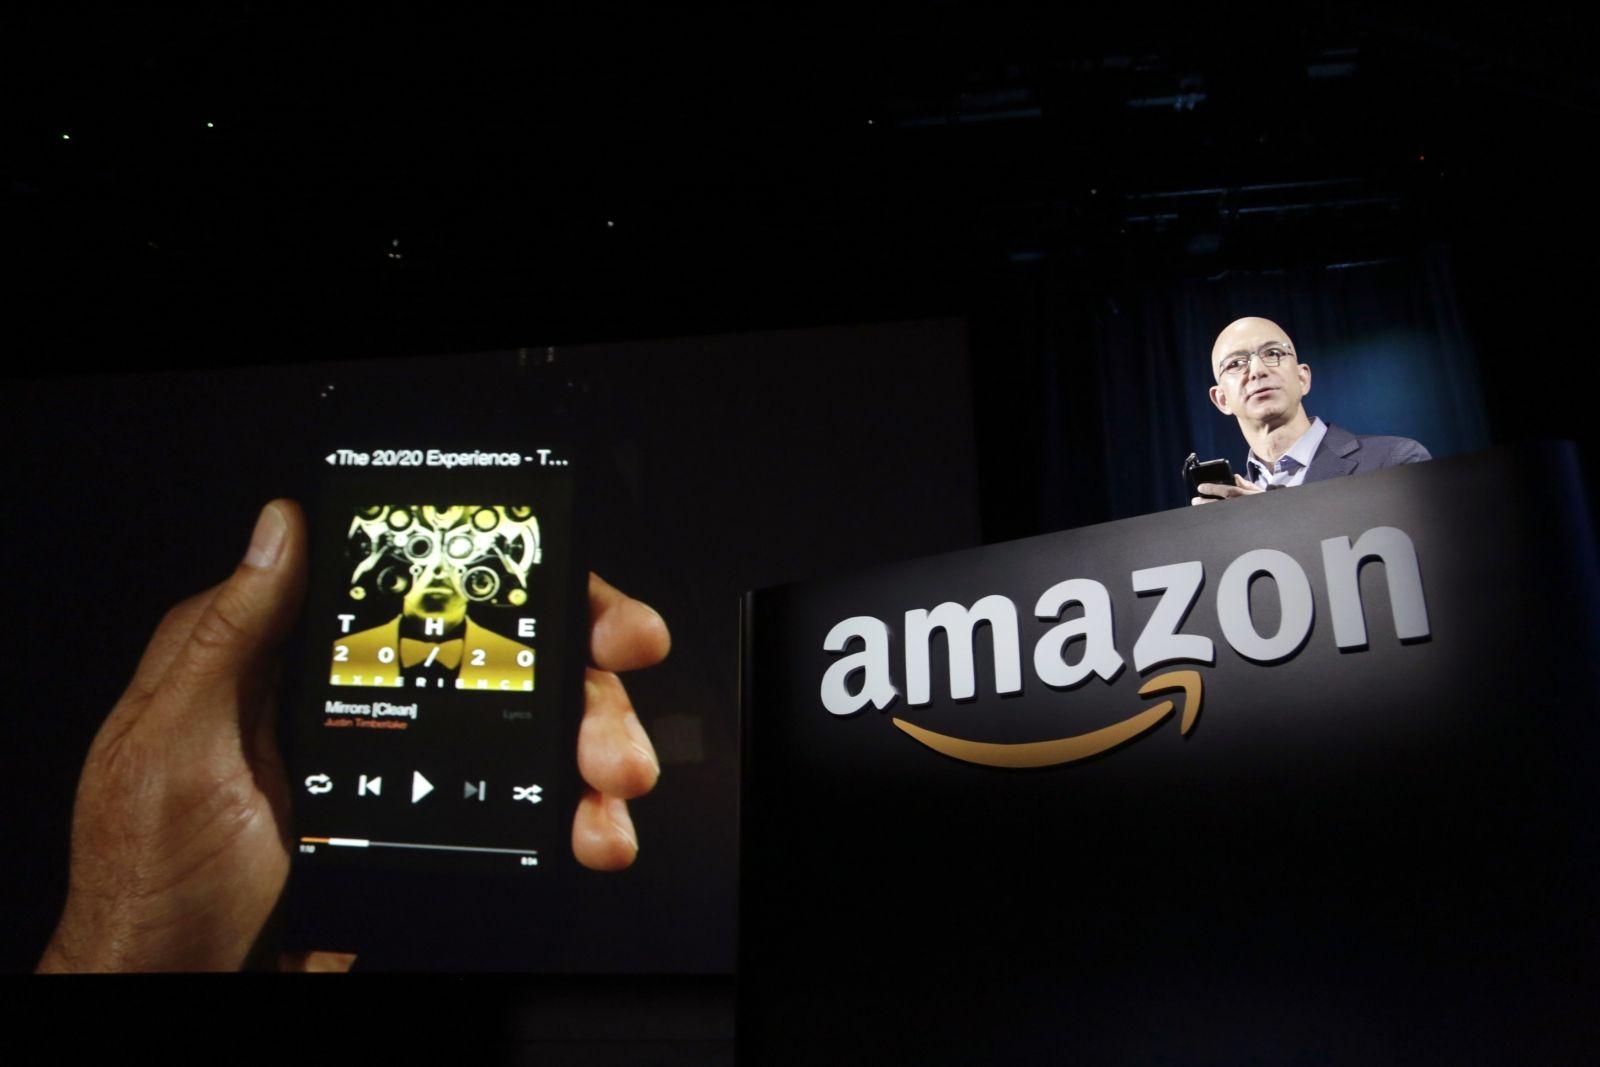 New Amazon Inc. tablet